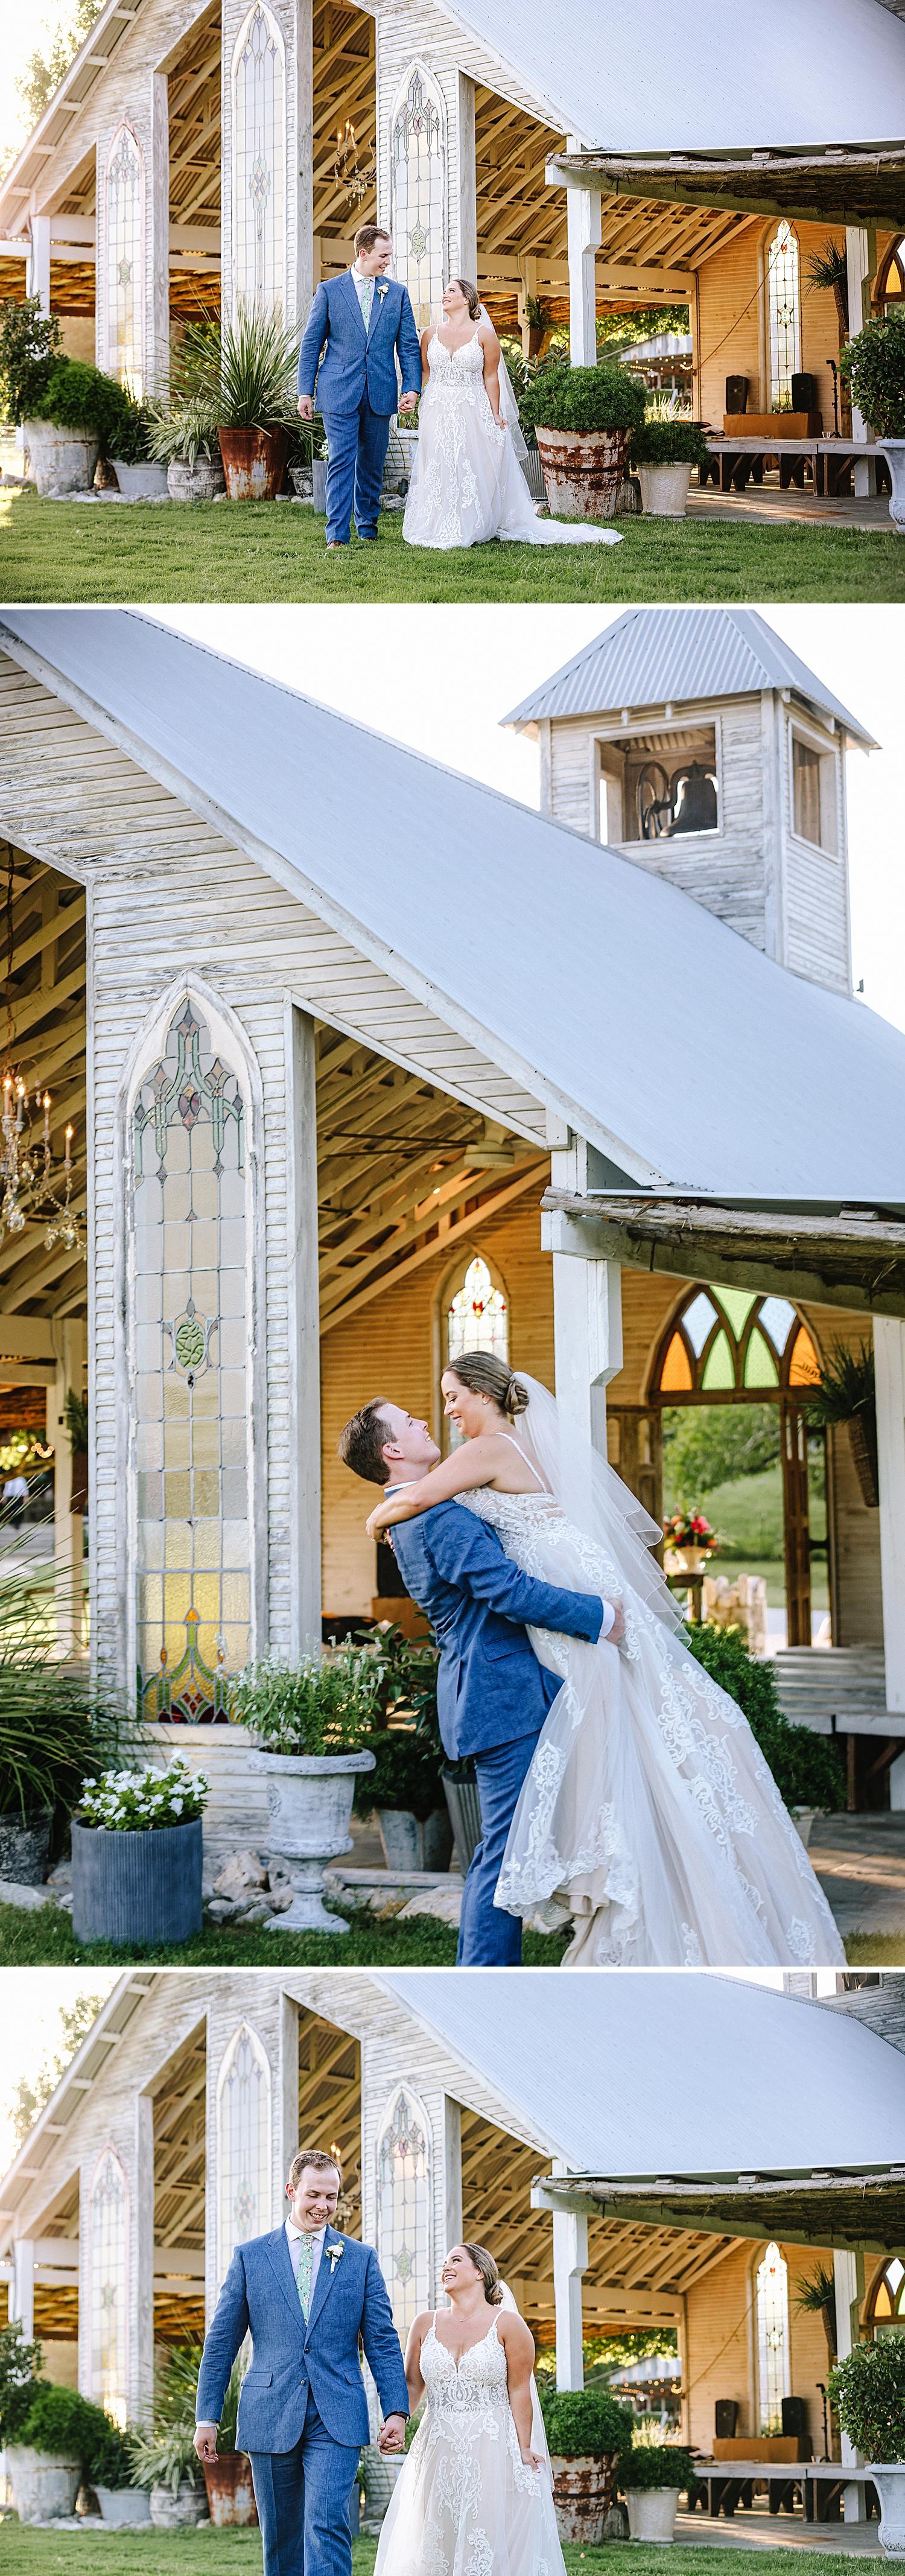 Gruene-Estate-Wedding-New-Braunfels-Bride-Wedding-Photos-Carly-Barton-Photography_0114.jpg